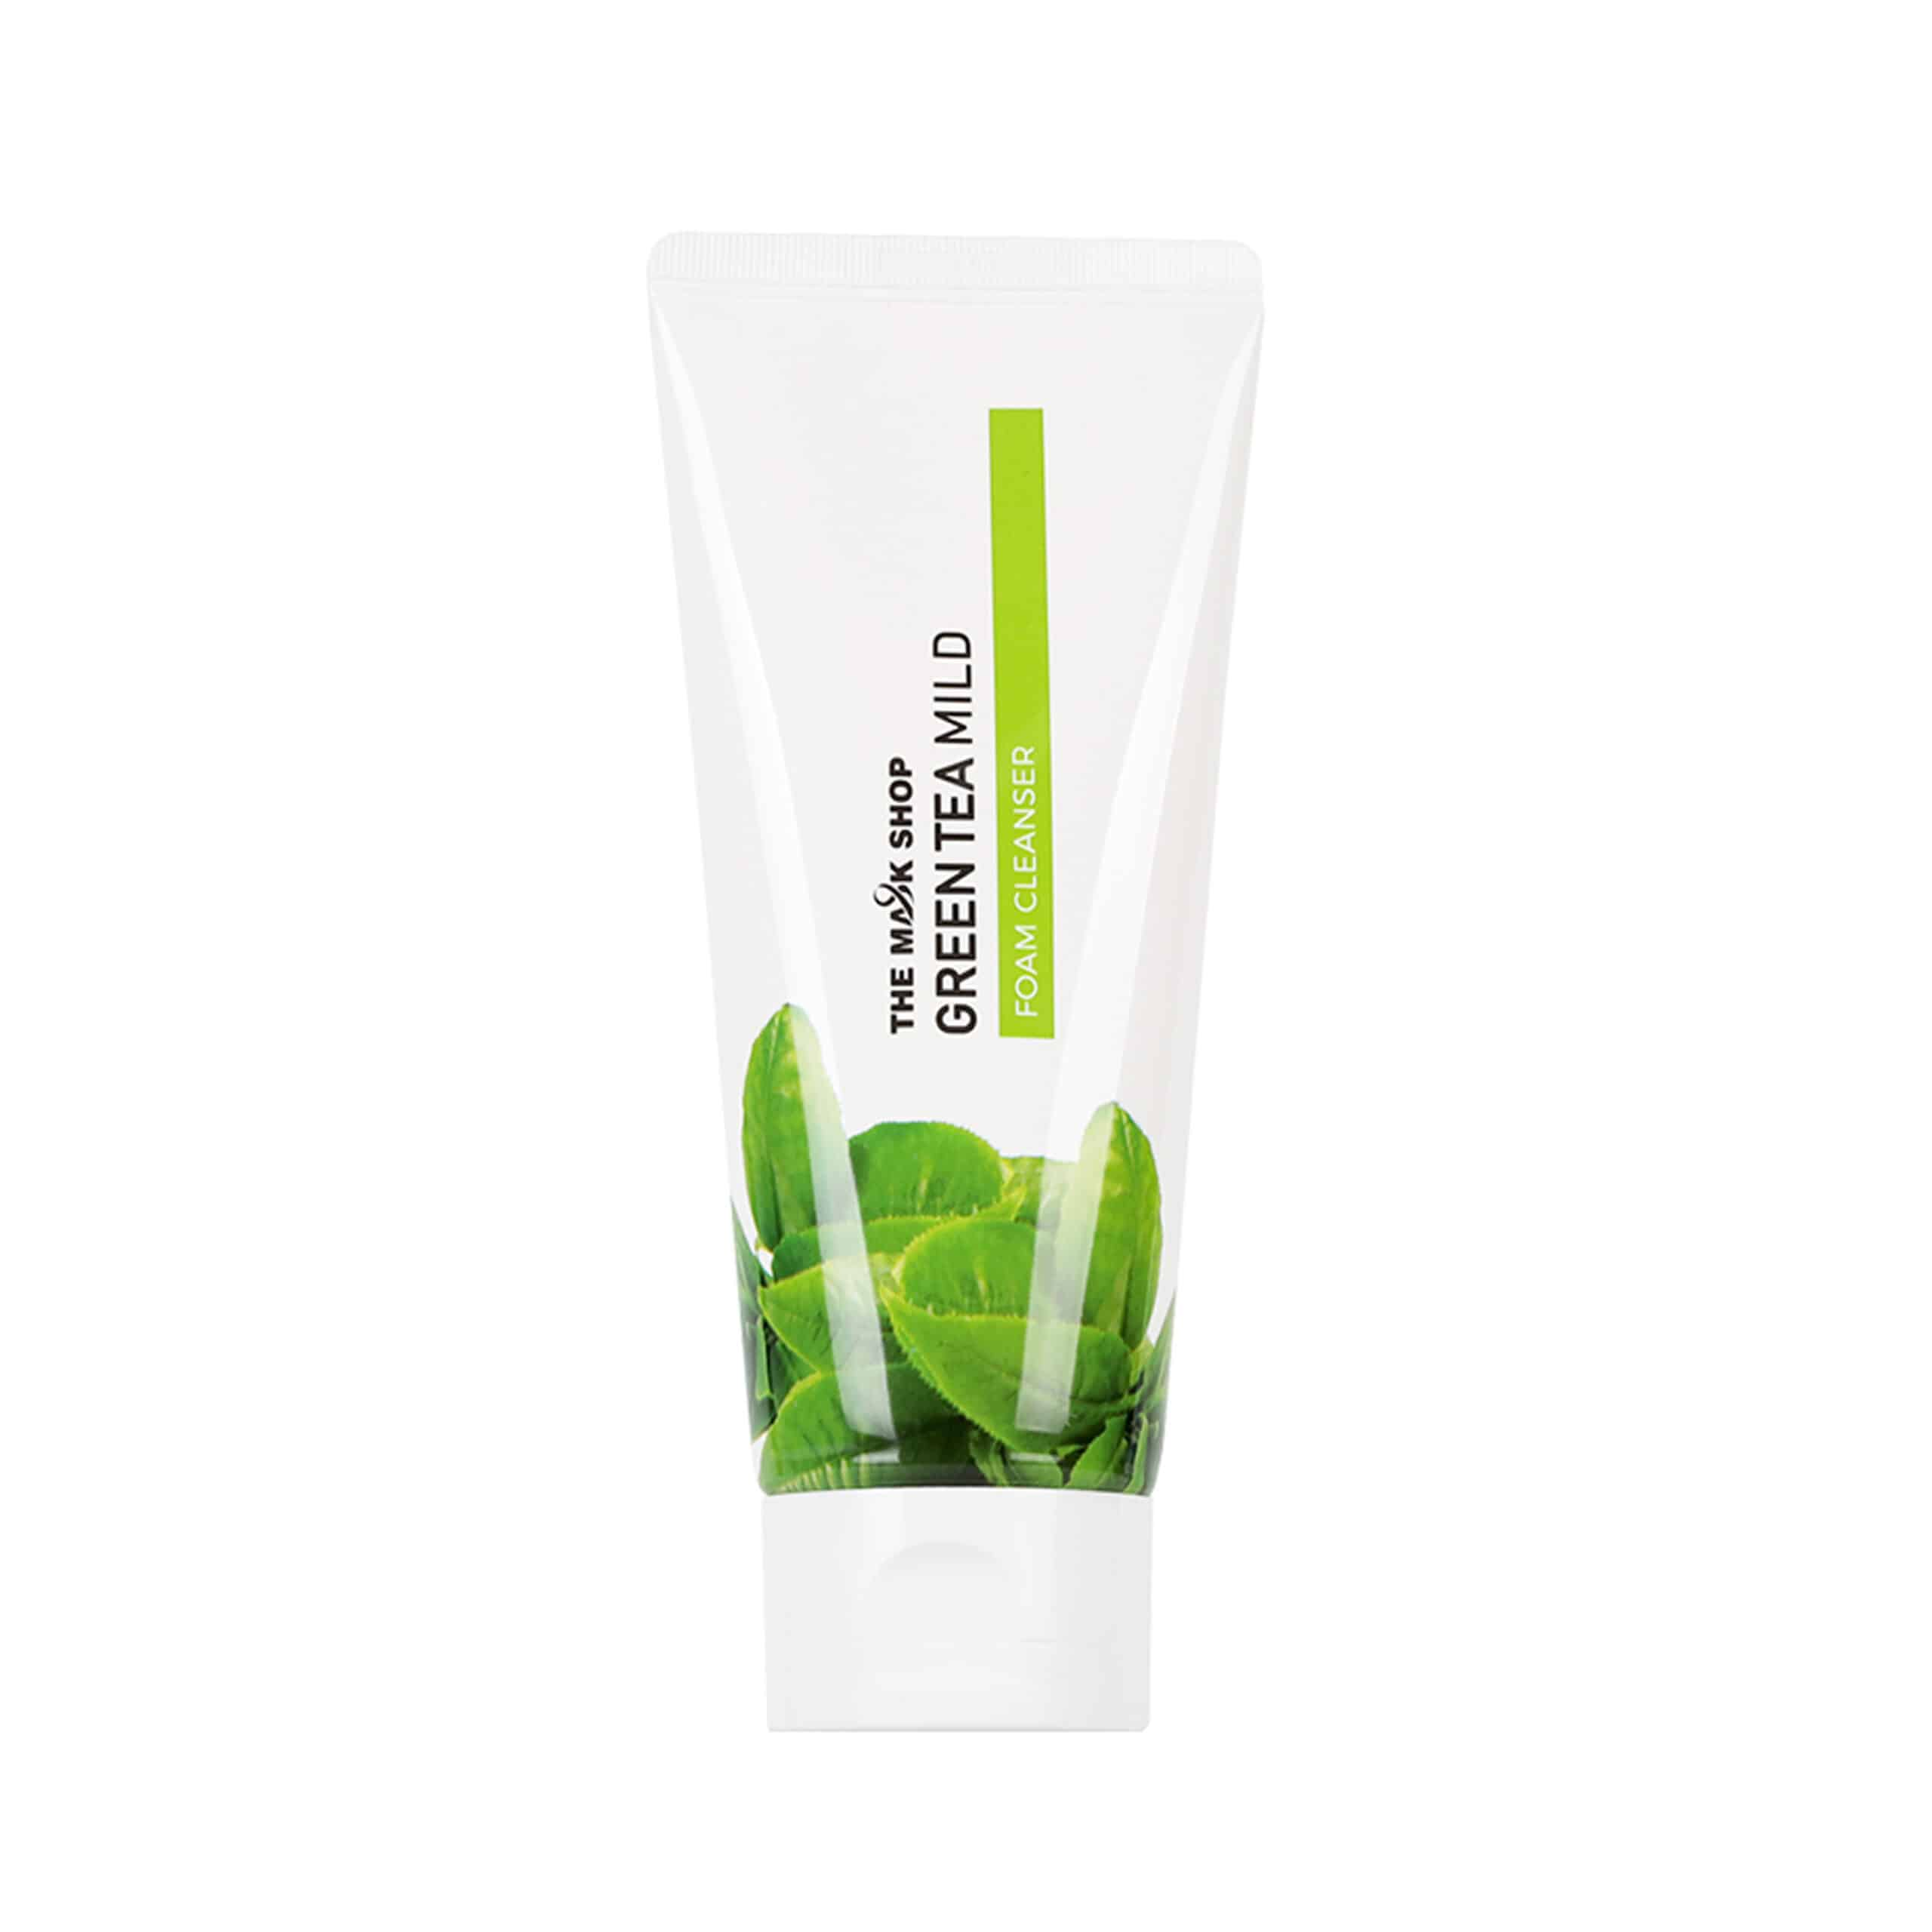 The-Mask-Shop-Green-Tea-Mild-Foam-Cleanser